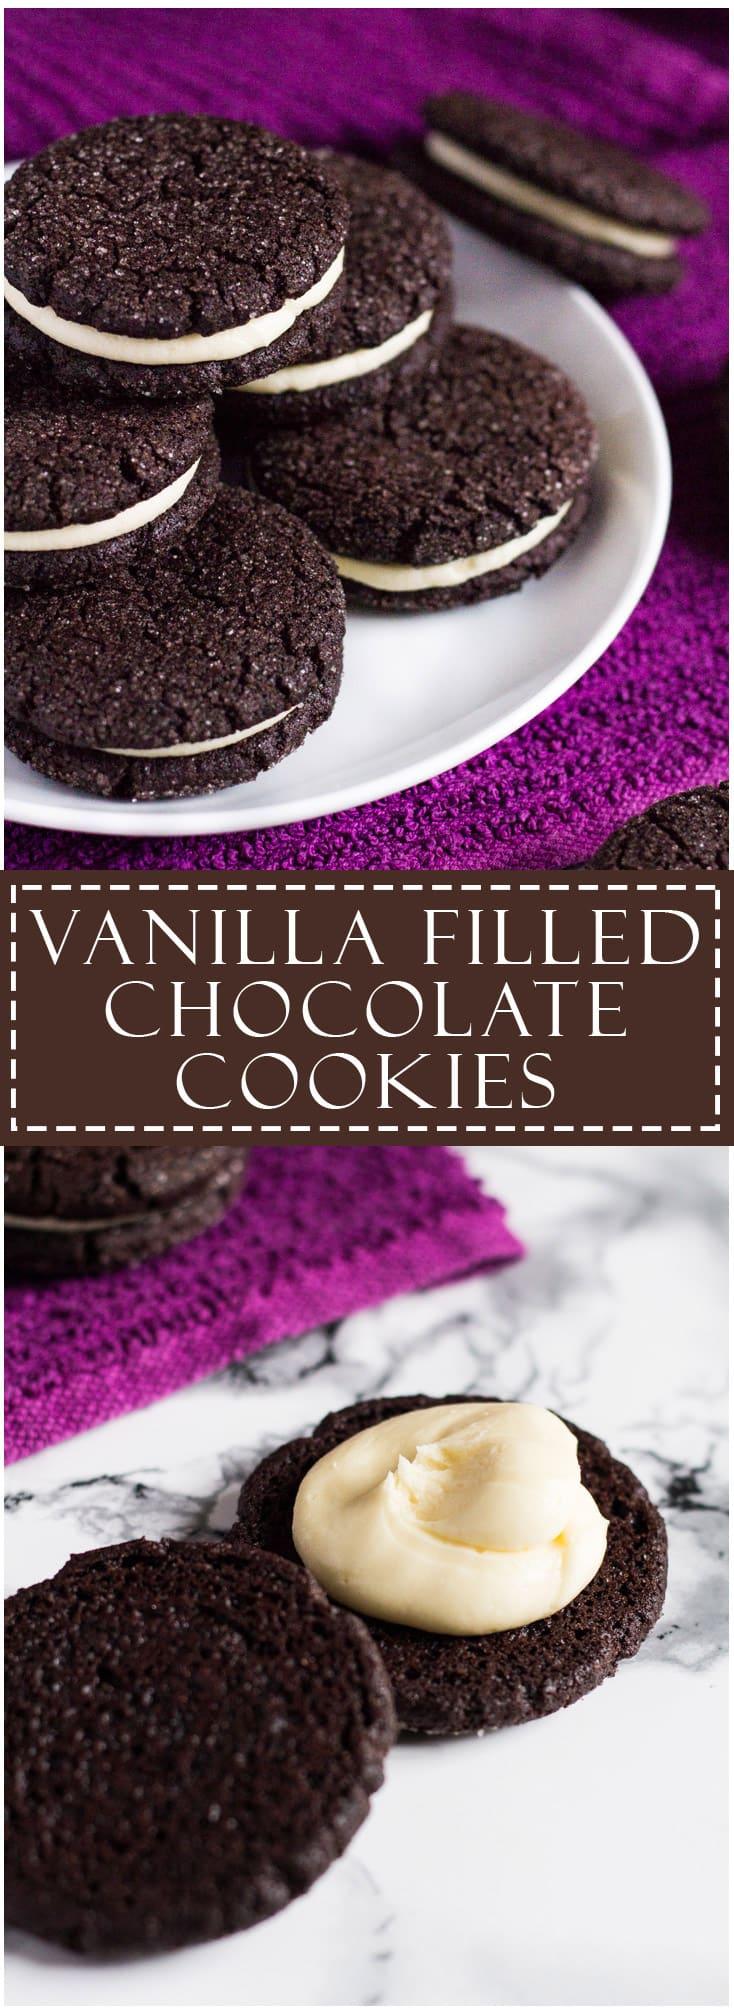 Vanilla-Filled Chocolate Cookies | marshasbakingaddiction.com @marshasbakeblog